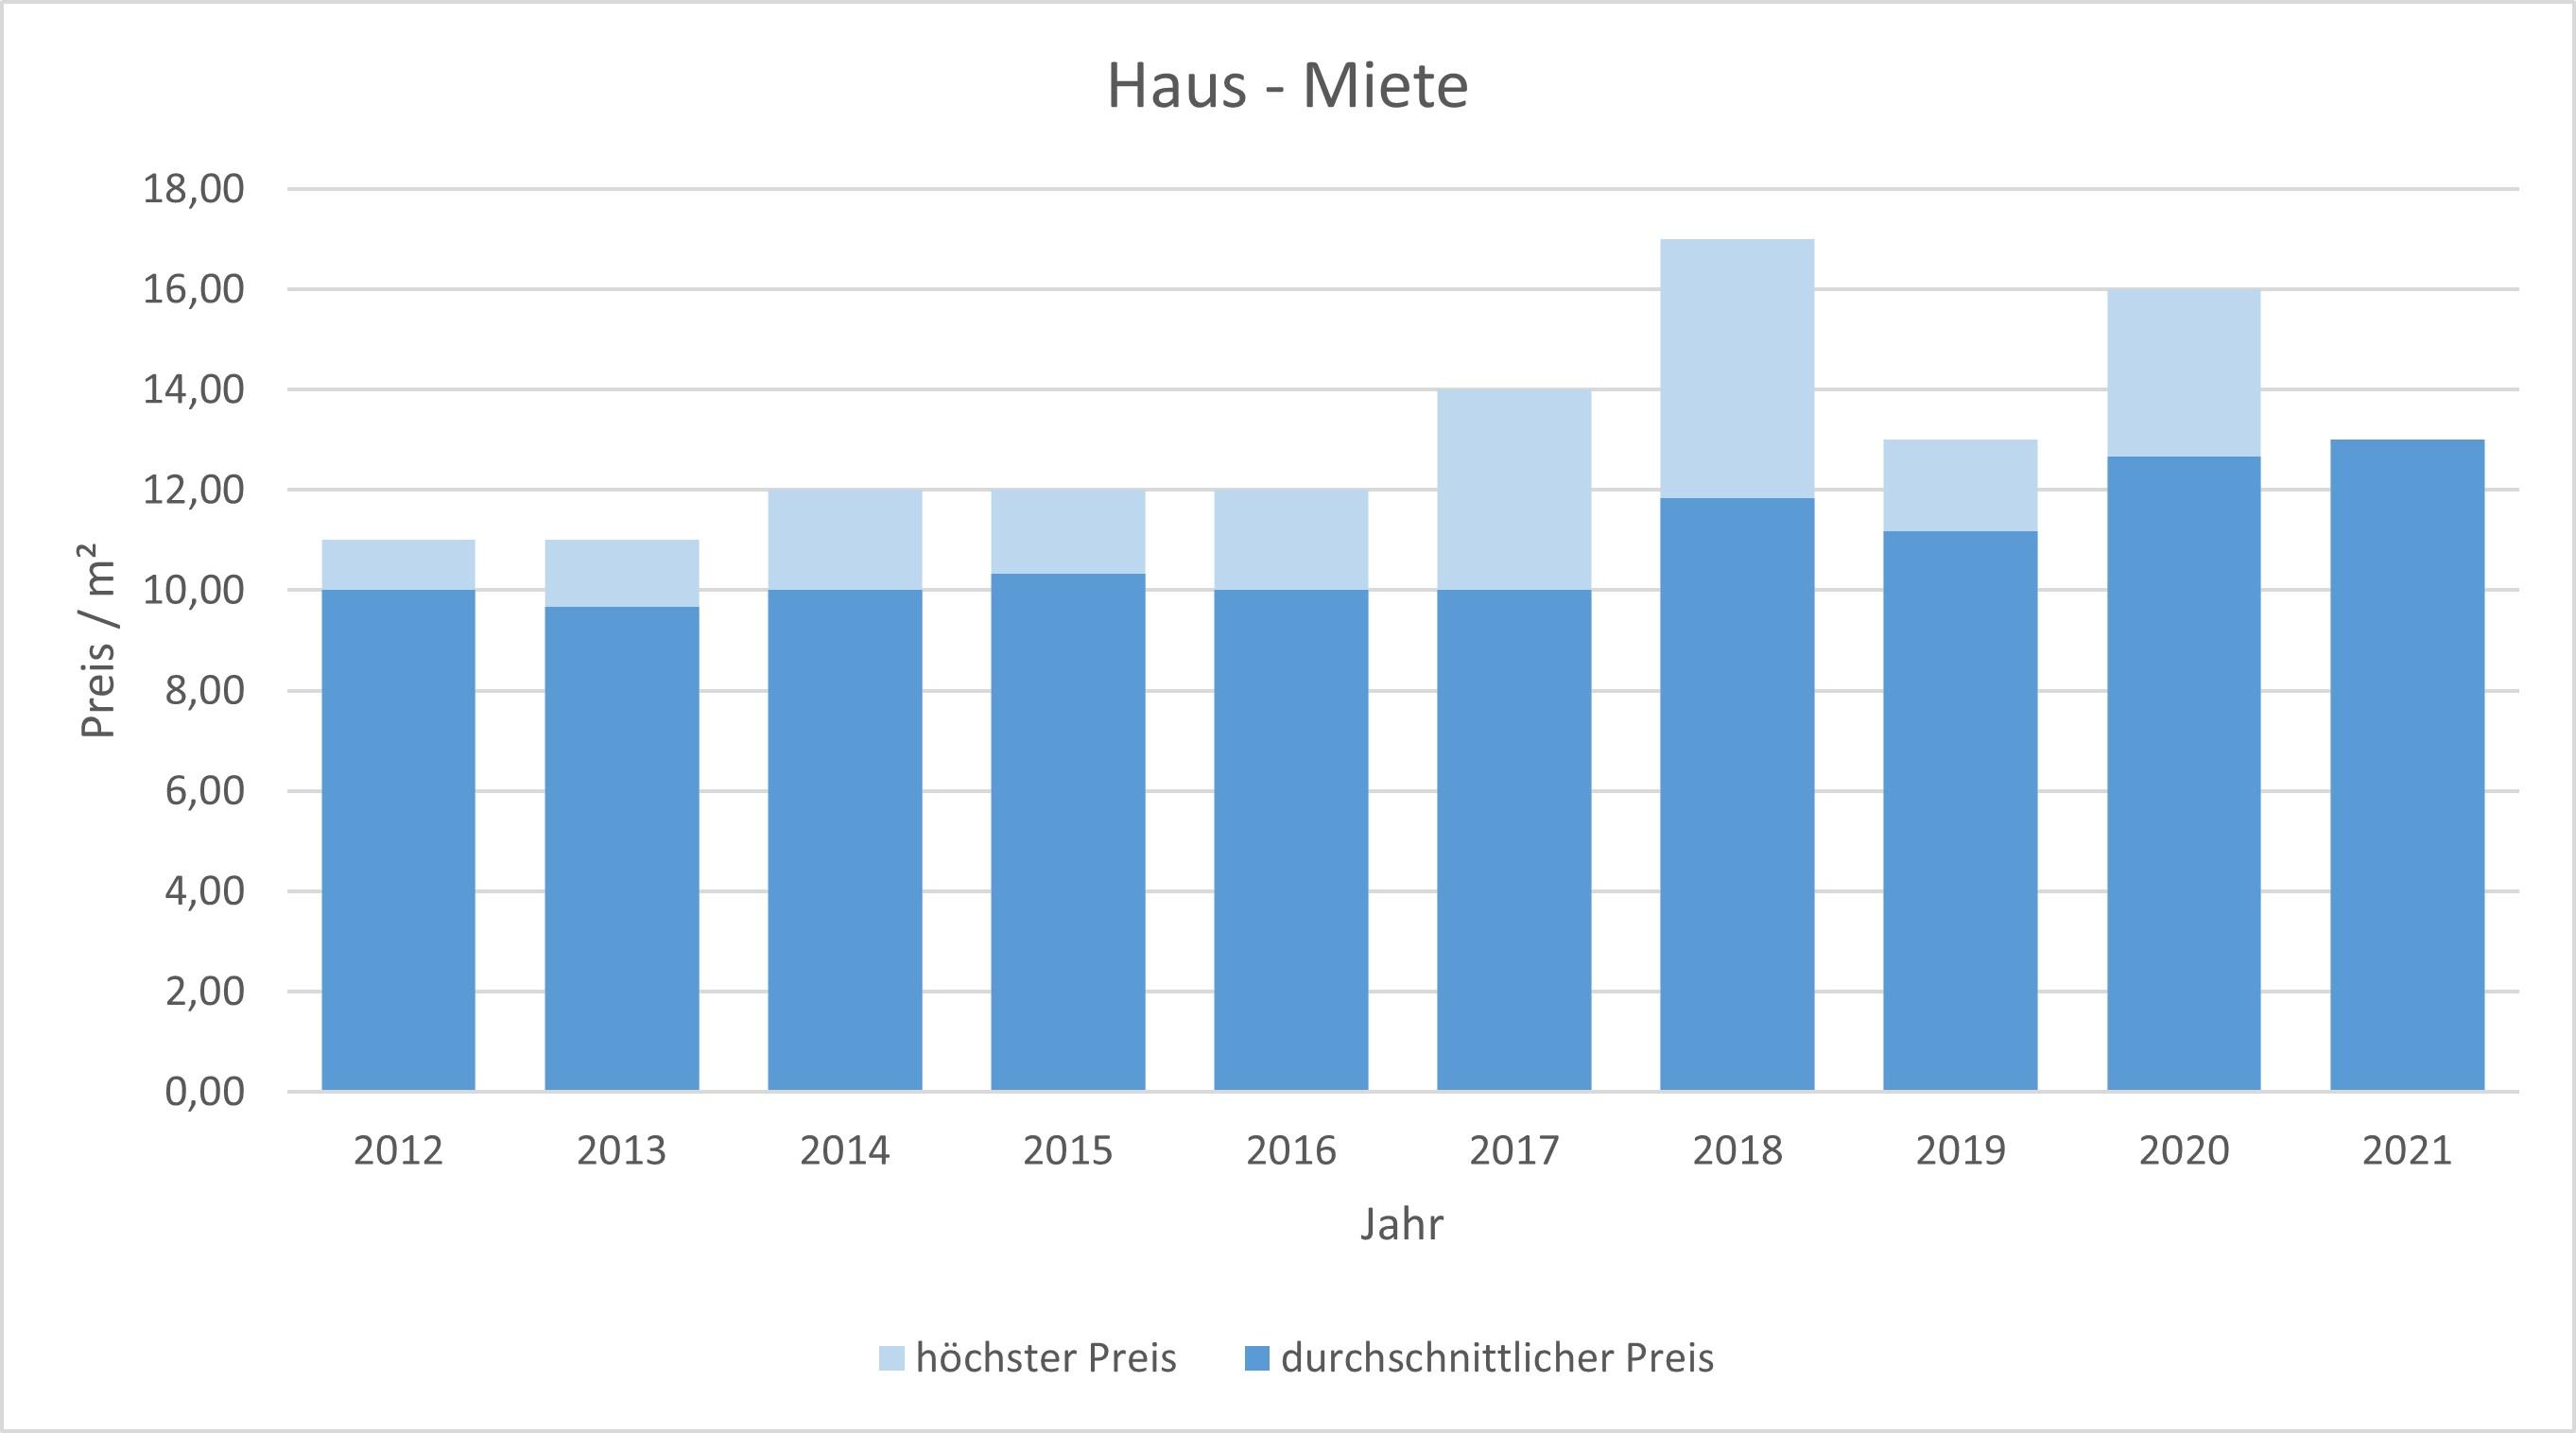 Weßling Haus mieten vermieten Preis Bewertung Makler www.happy-immo.de 2019 2020 2021